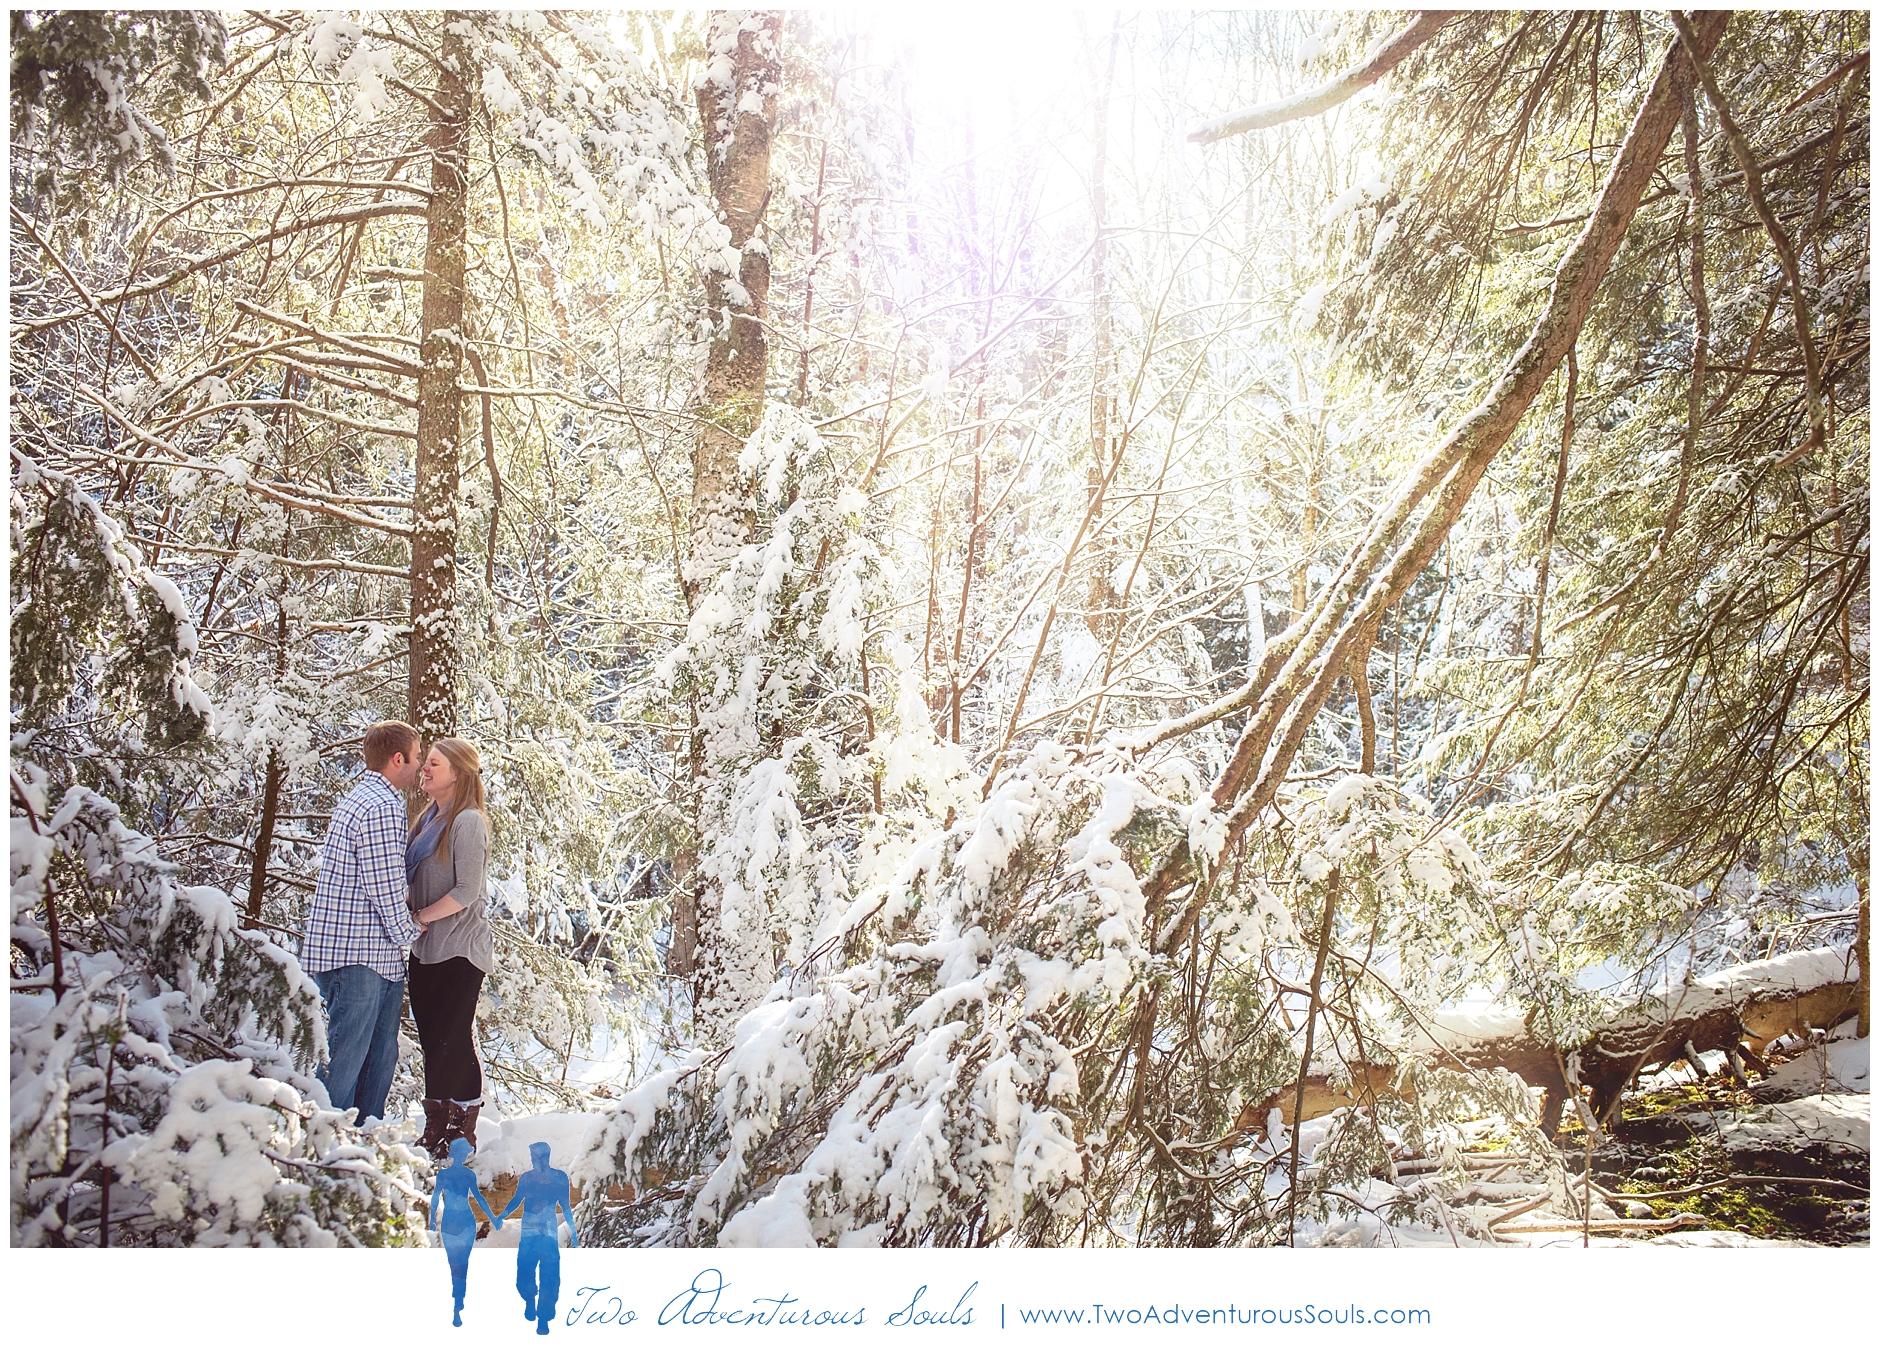 012515_Krystal-Matt-engagement-9_WEB-Maine-Wedding-and-Portrait-Photographer.jpg